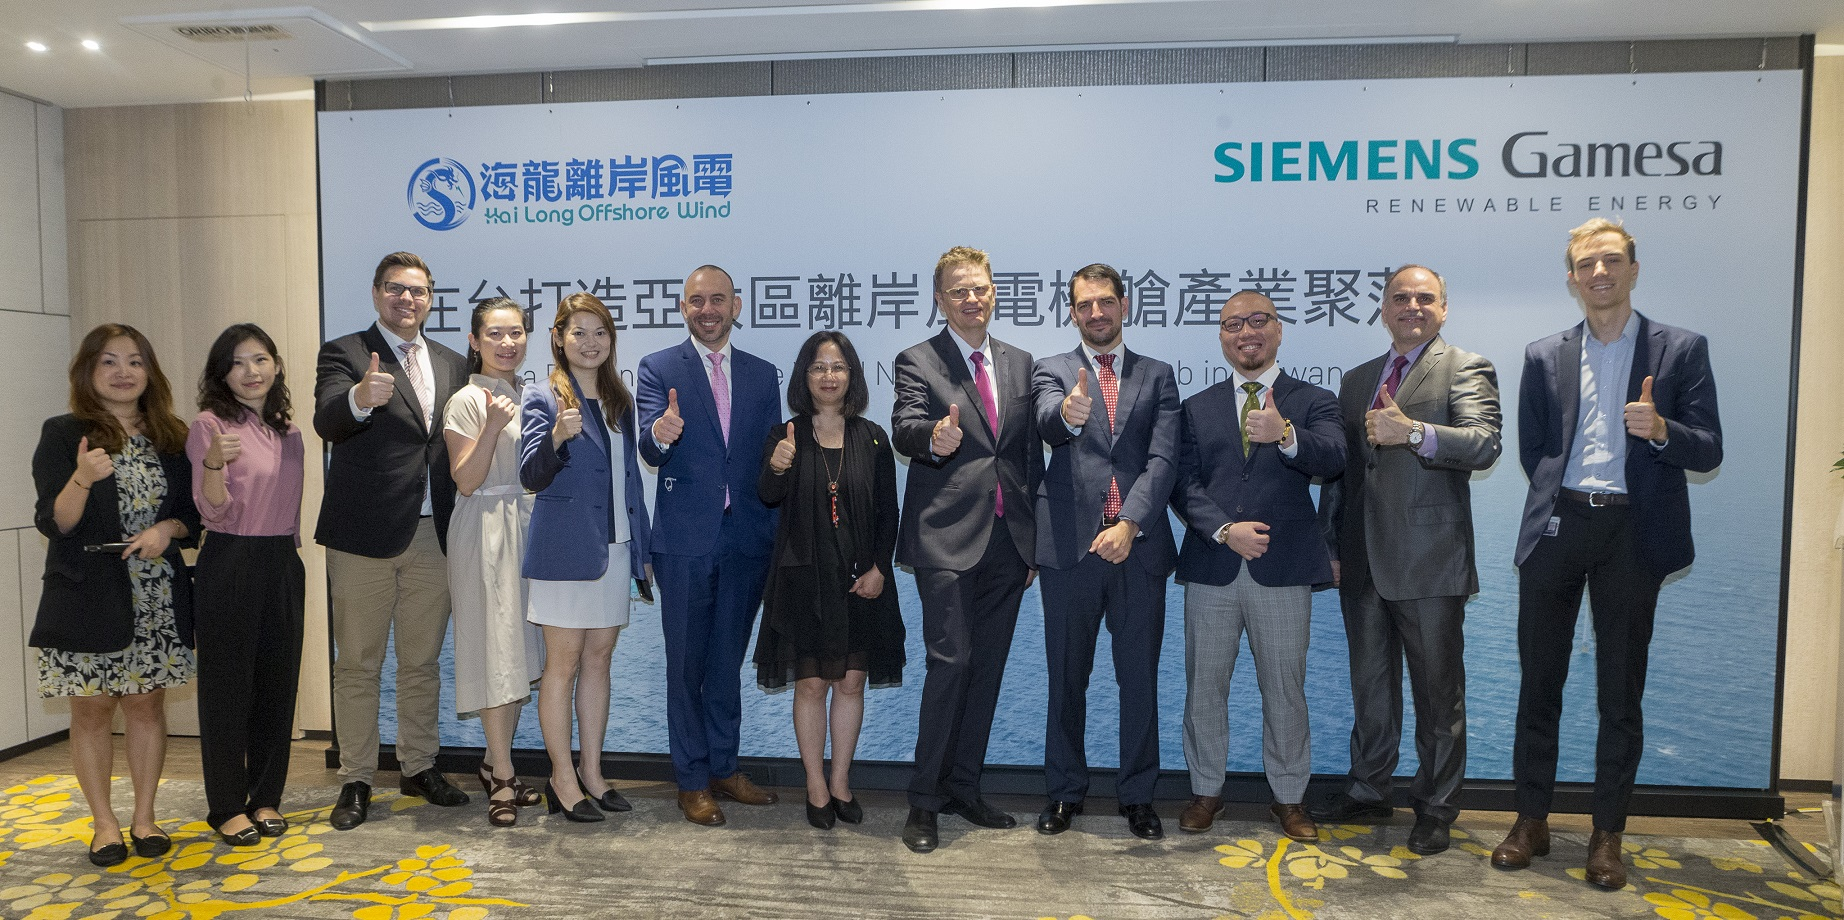 Siemens Gamesa Unveils Major Expansion Plans in Taiwan